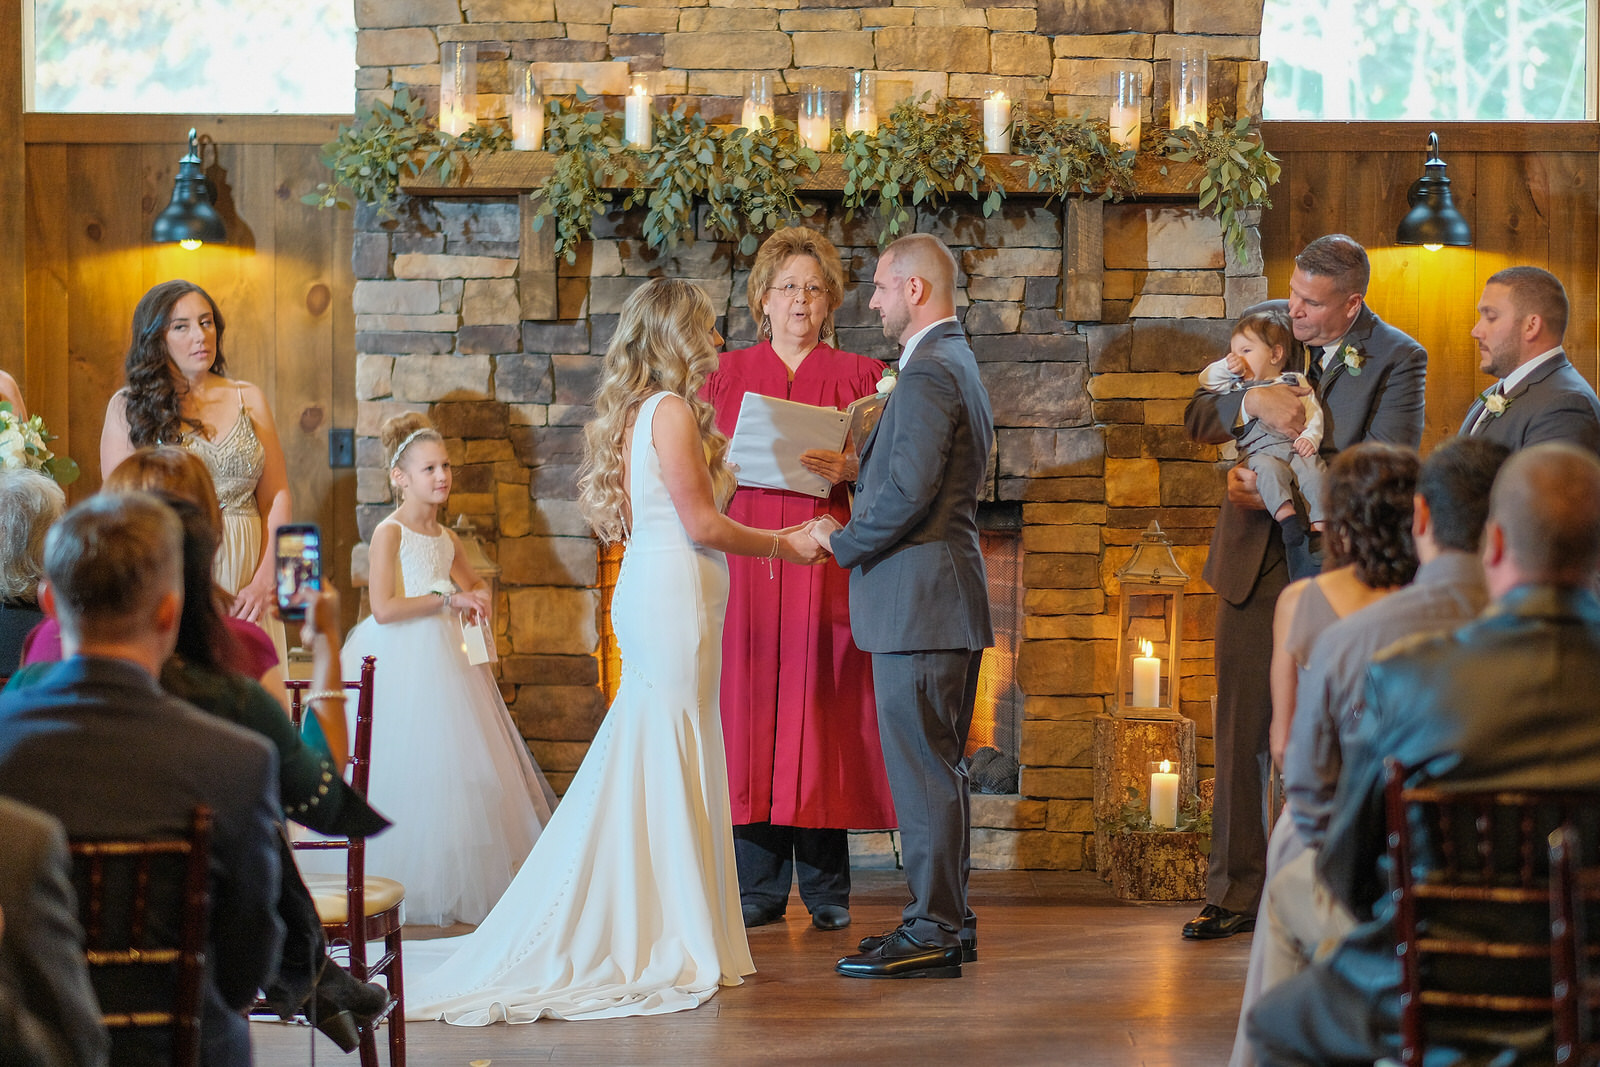 birch-wood-vineyards-wedding-photography-385.jpg